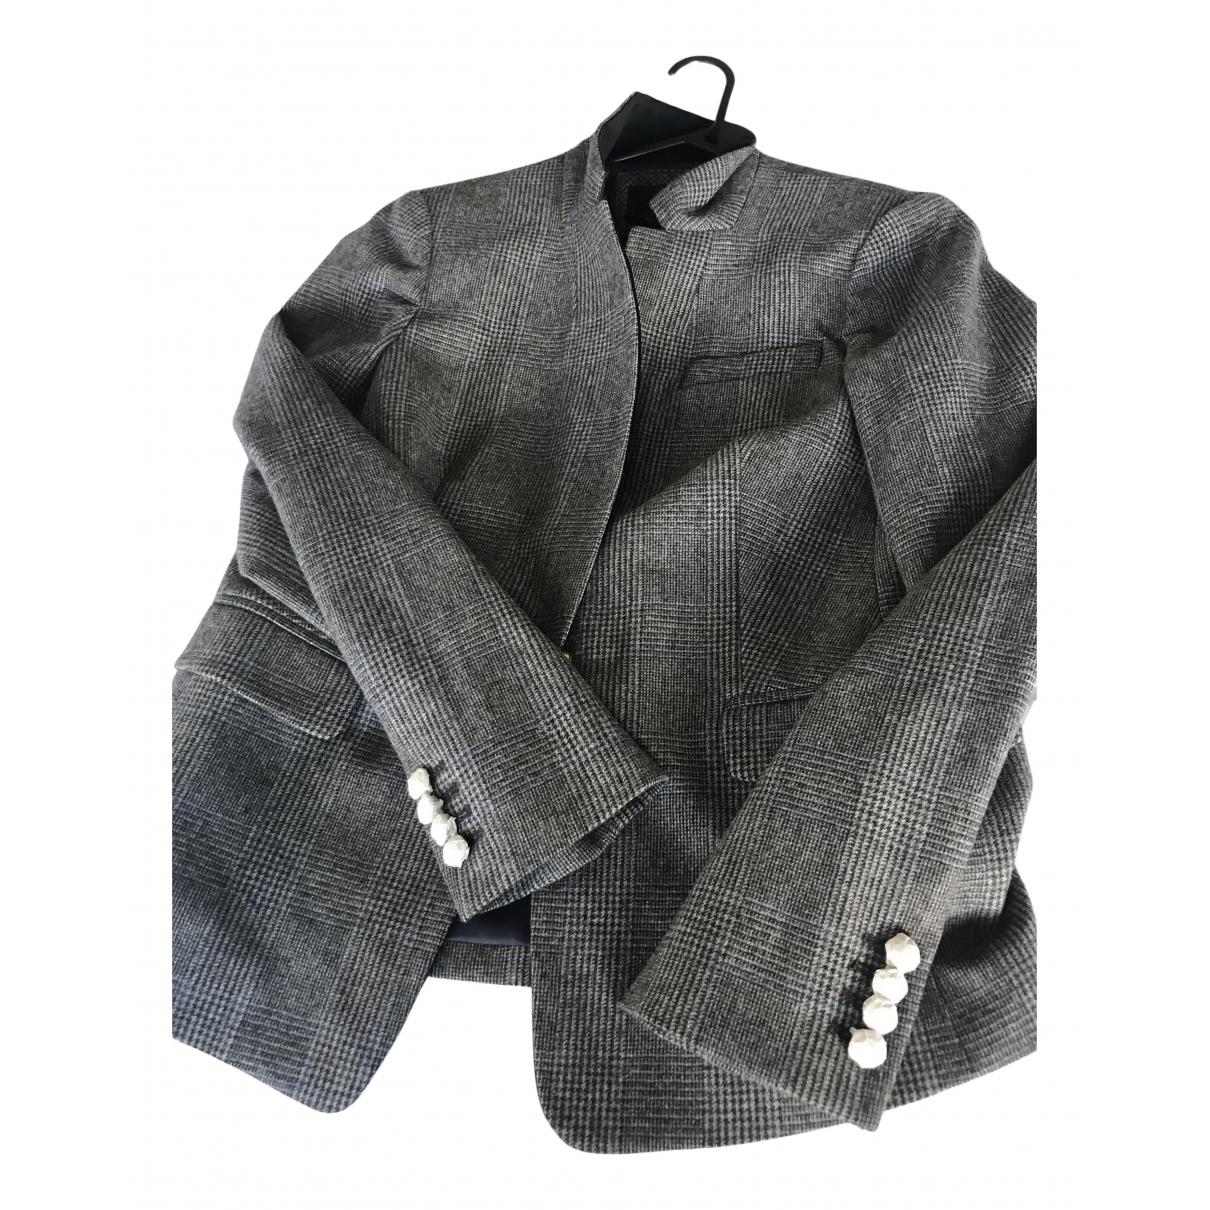 J.crew N Multicolour Wool jacket for Women 14-16 US